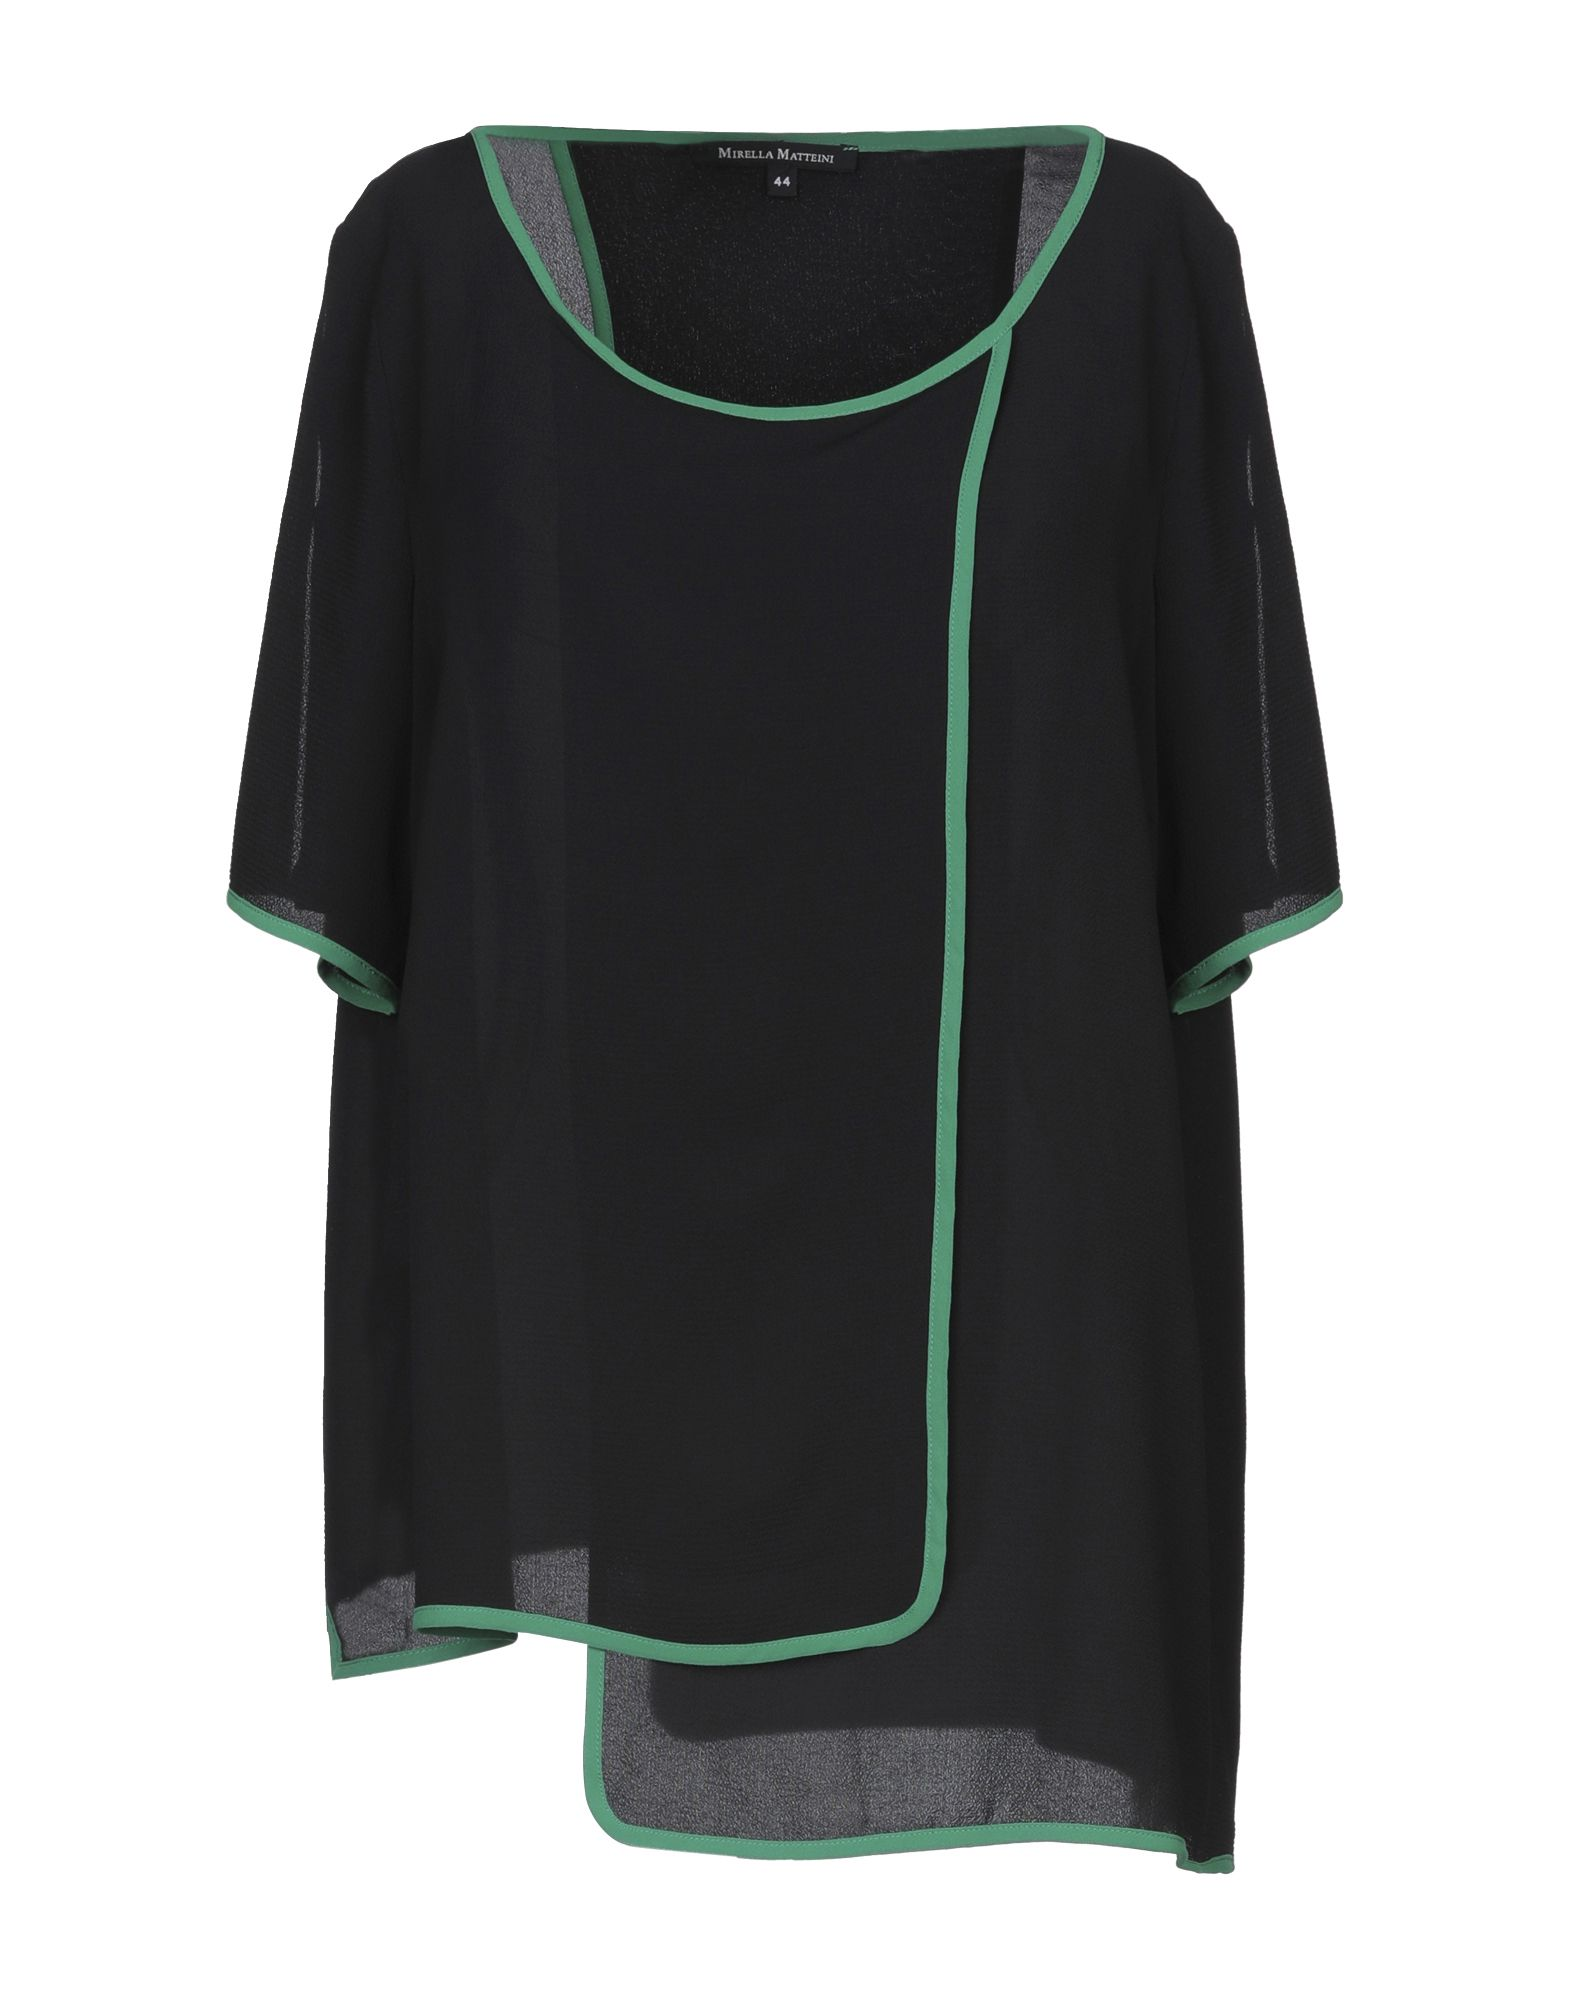 MIRELLA MATTEINI Блузка mirella matteini повседневные брюки